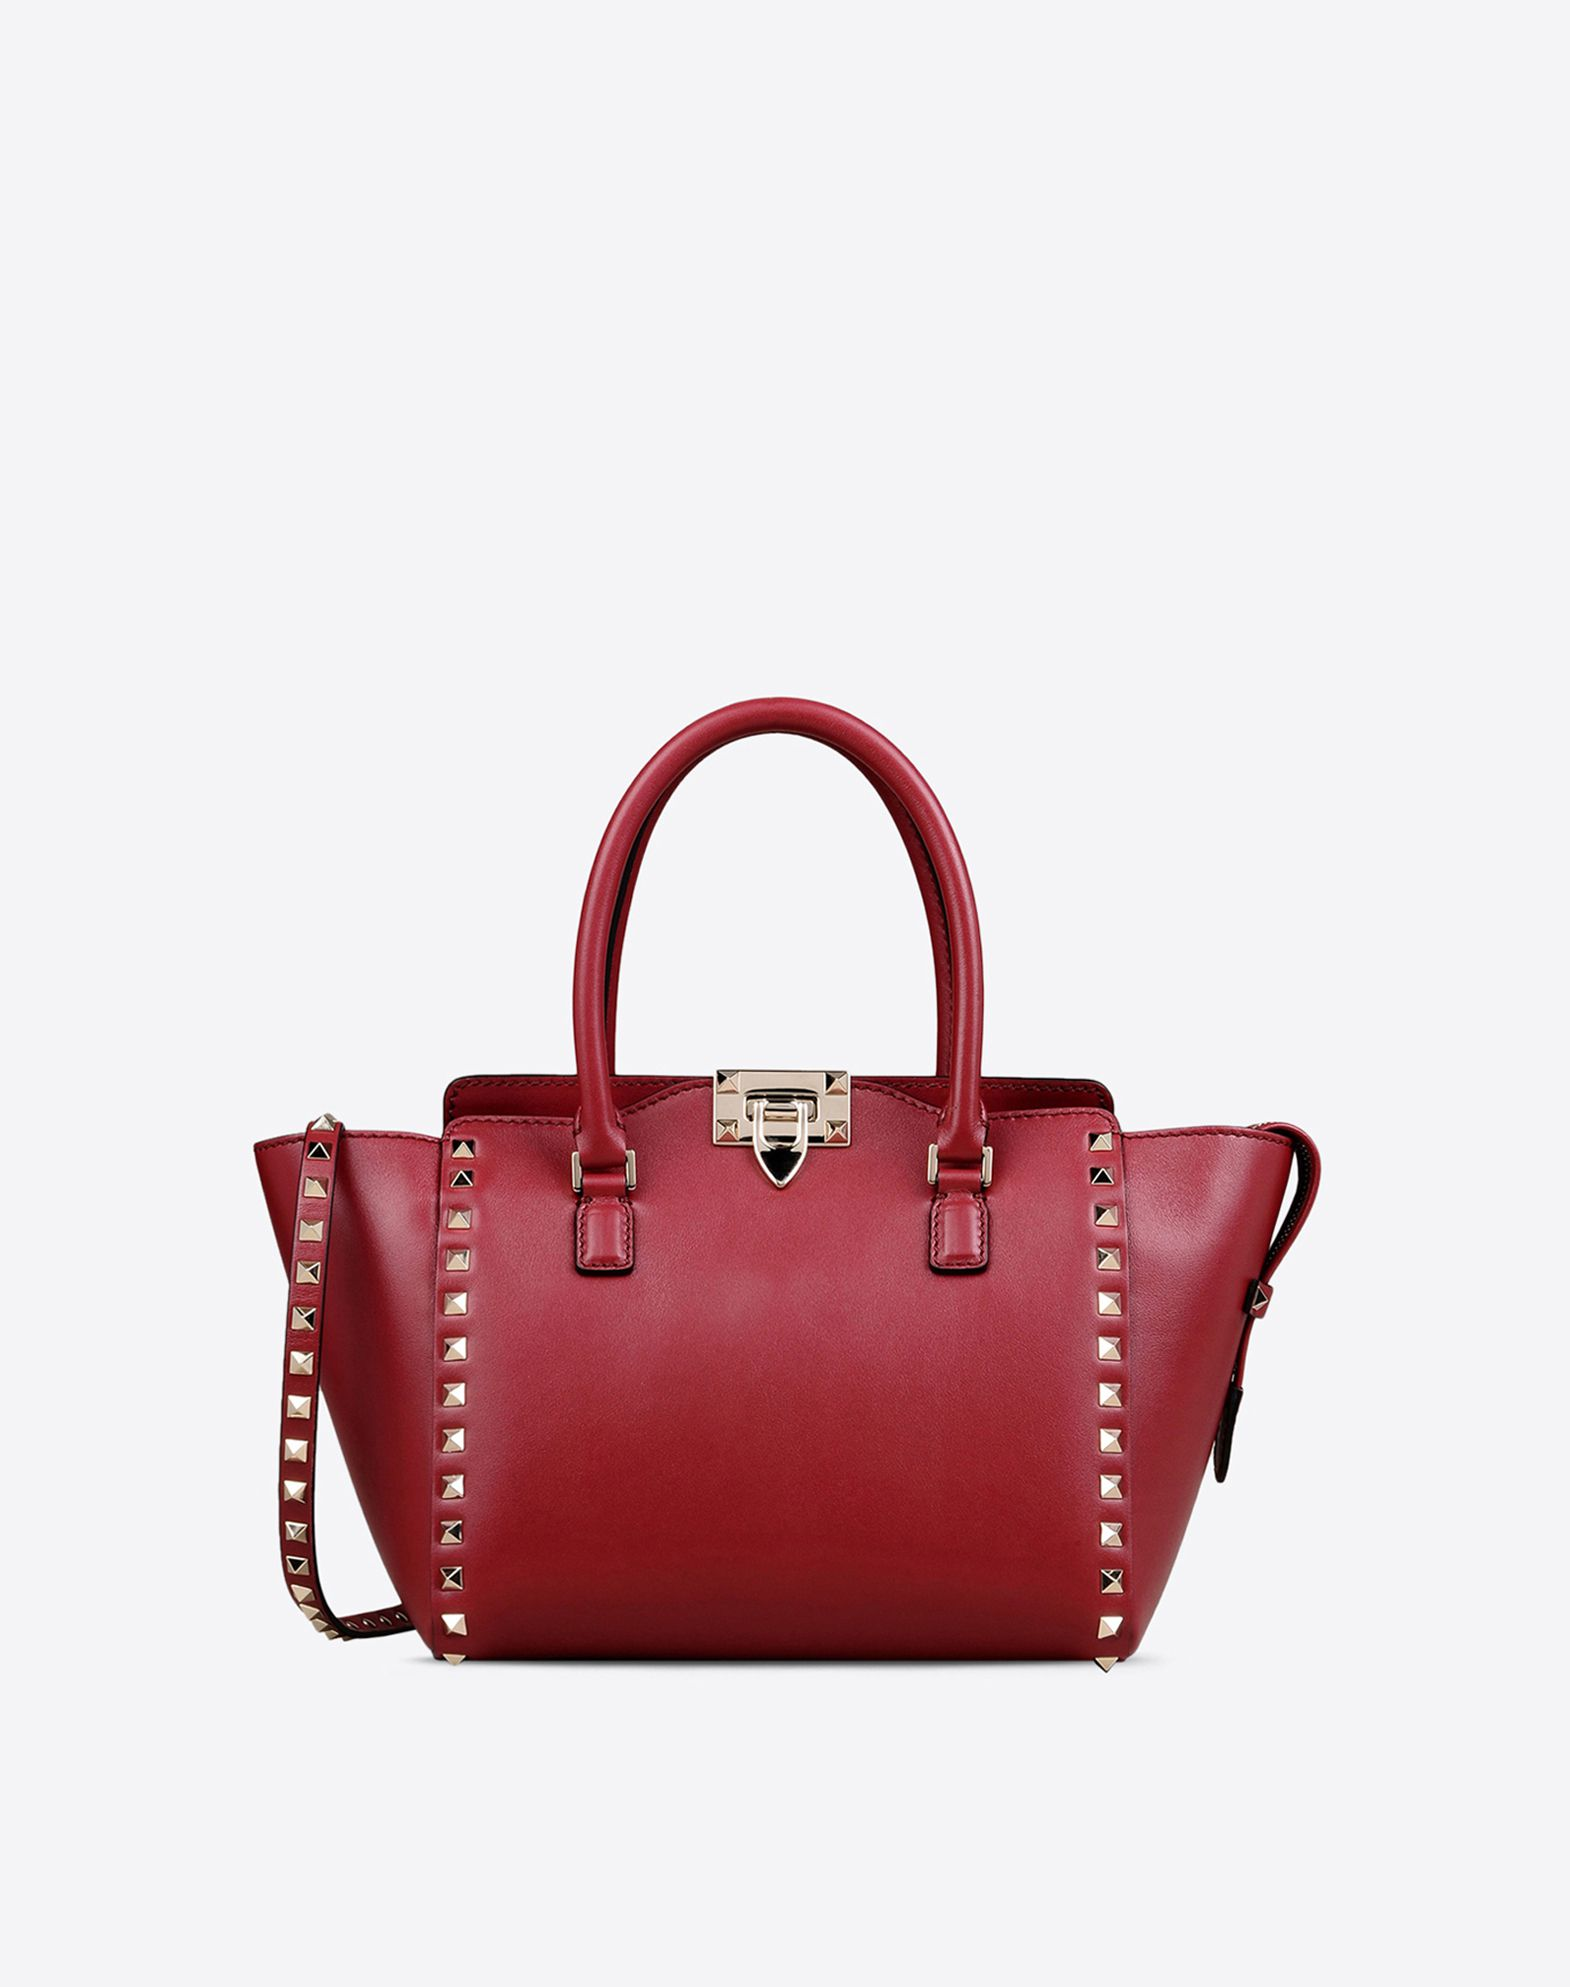 Valentino Garavani Rockstud Small Double Handle tote bag - Red Valentino vZKgdcrcG